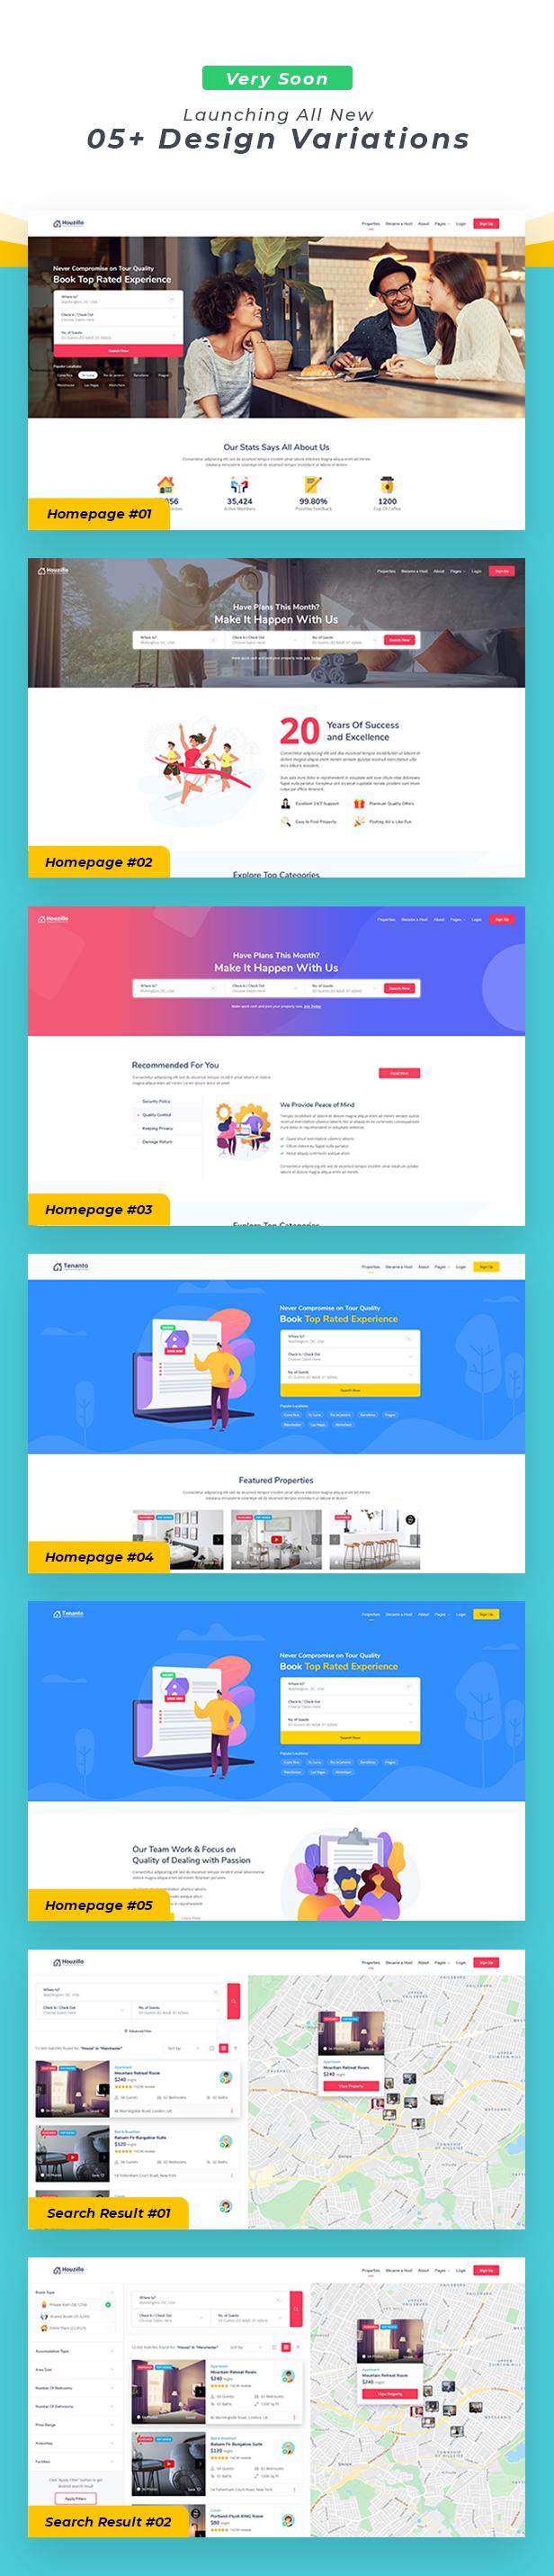 Houzillo - Bookings and Rental WordPress Theme - 3